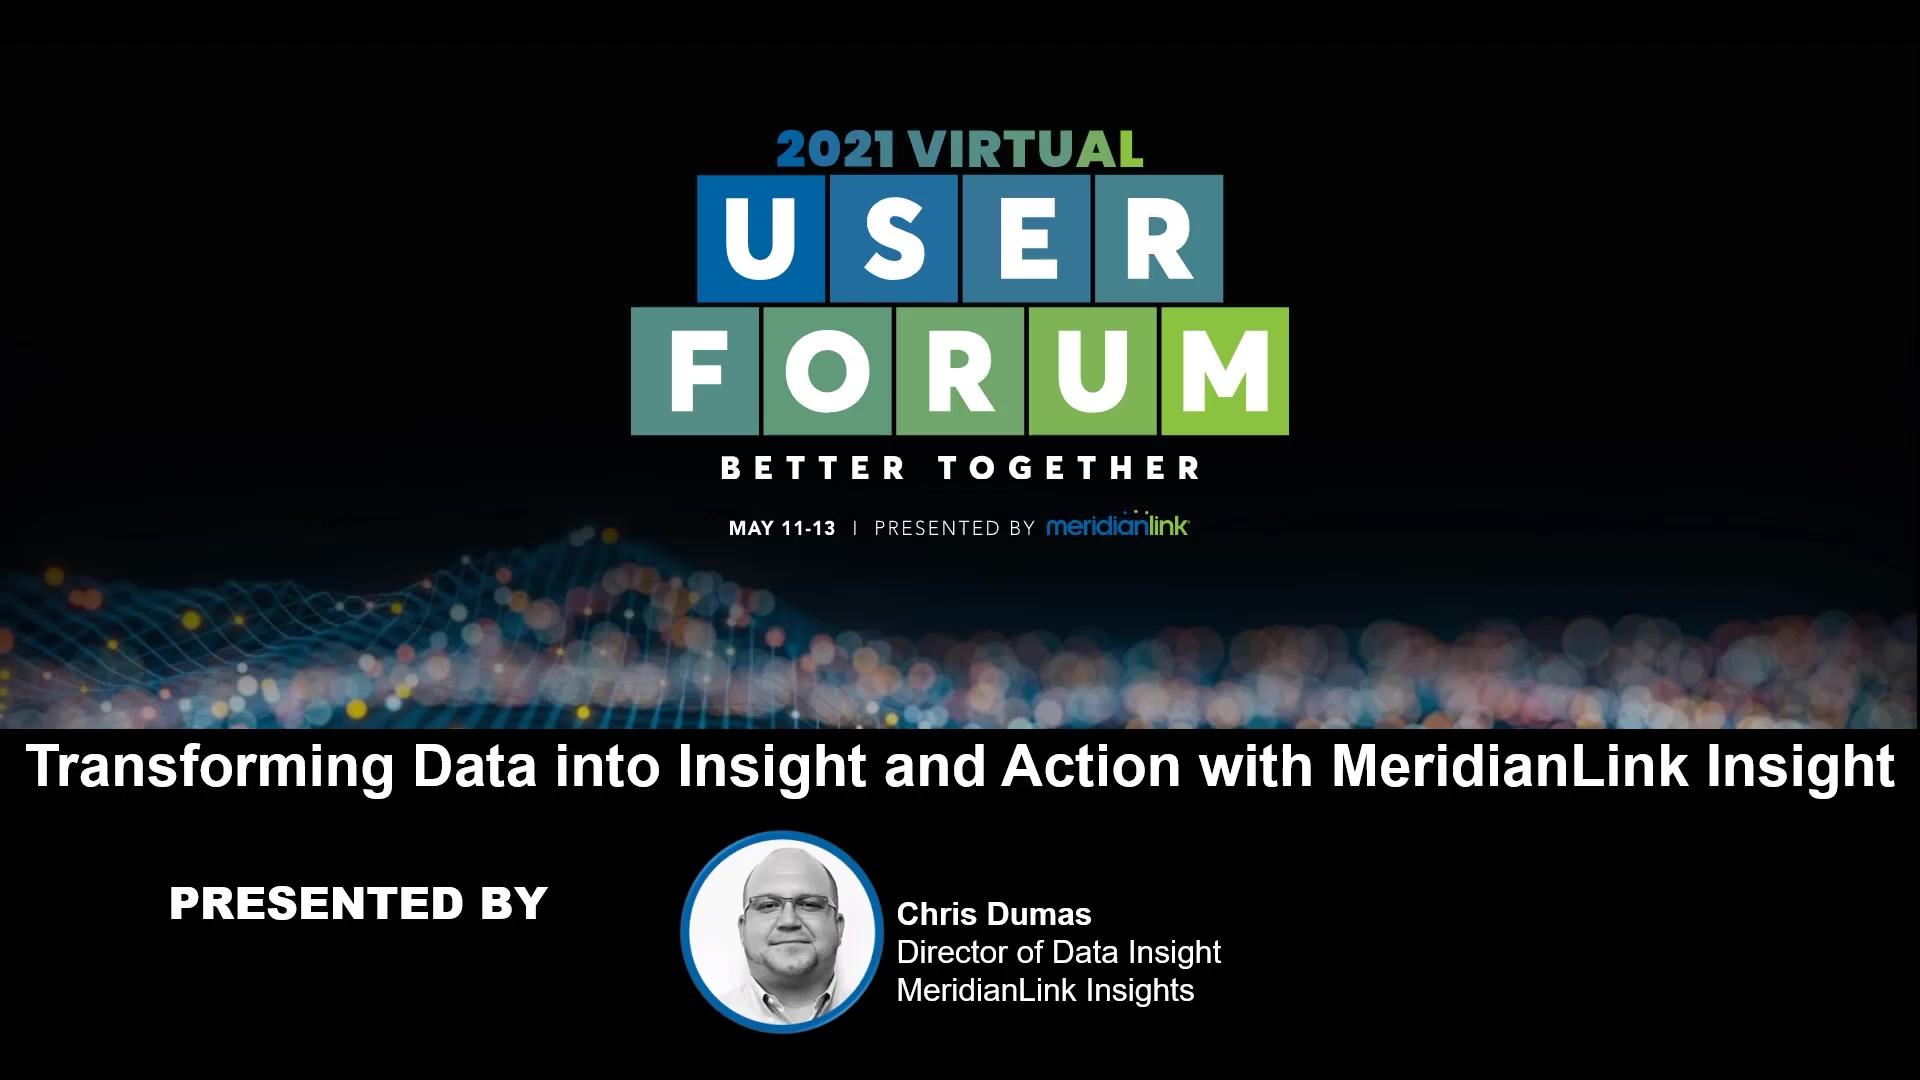 MeridianLink Insight Demonstration